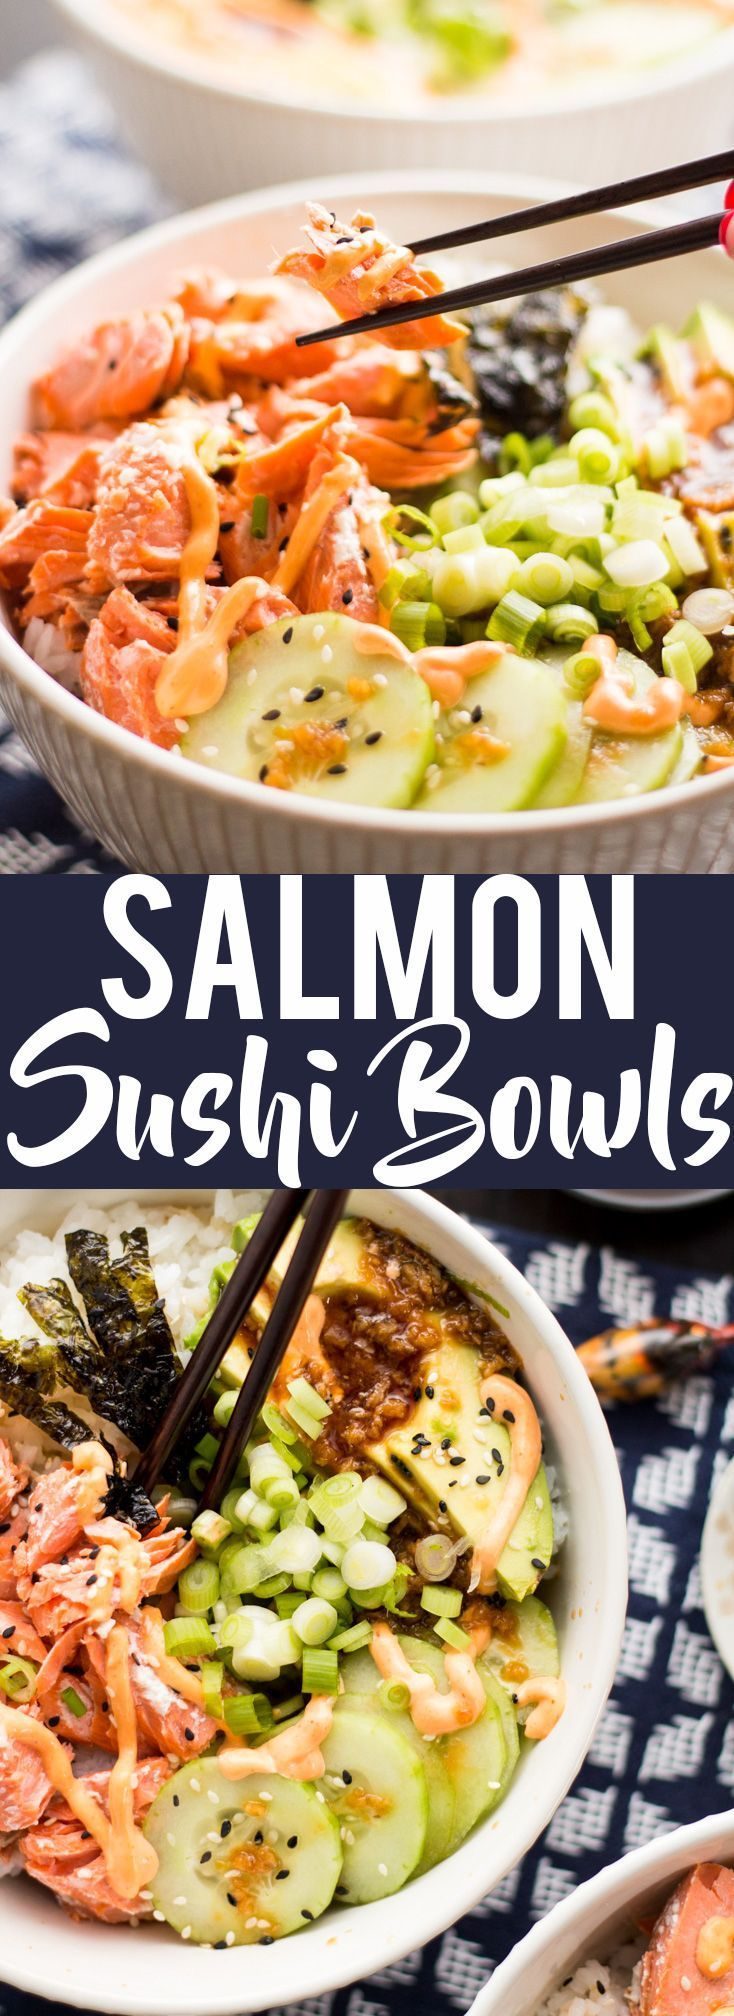 Salmon Recipes   Sushi   Sushi Bowls #ad